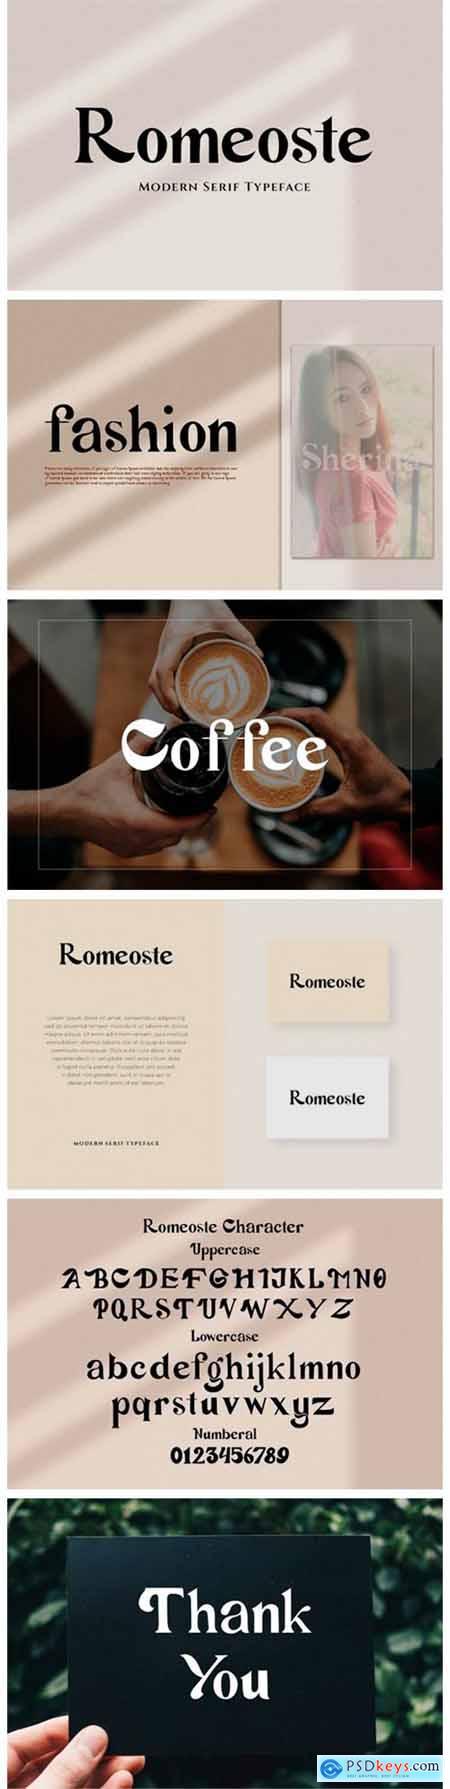 Romeoste Font